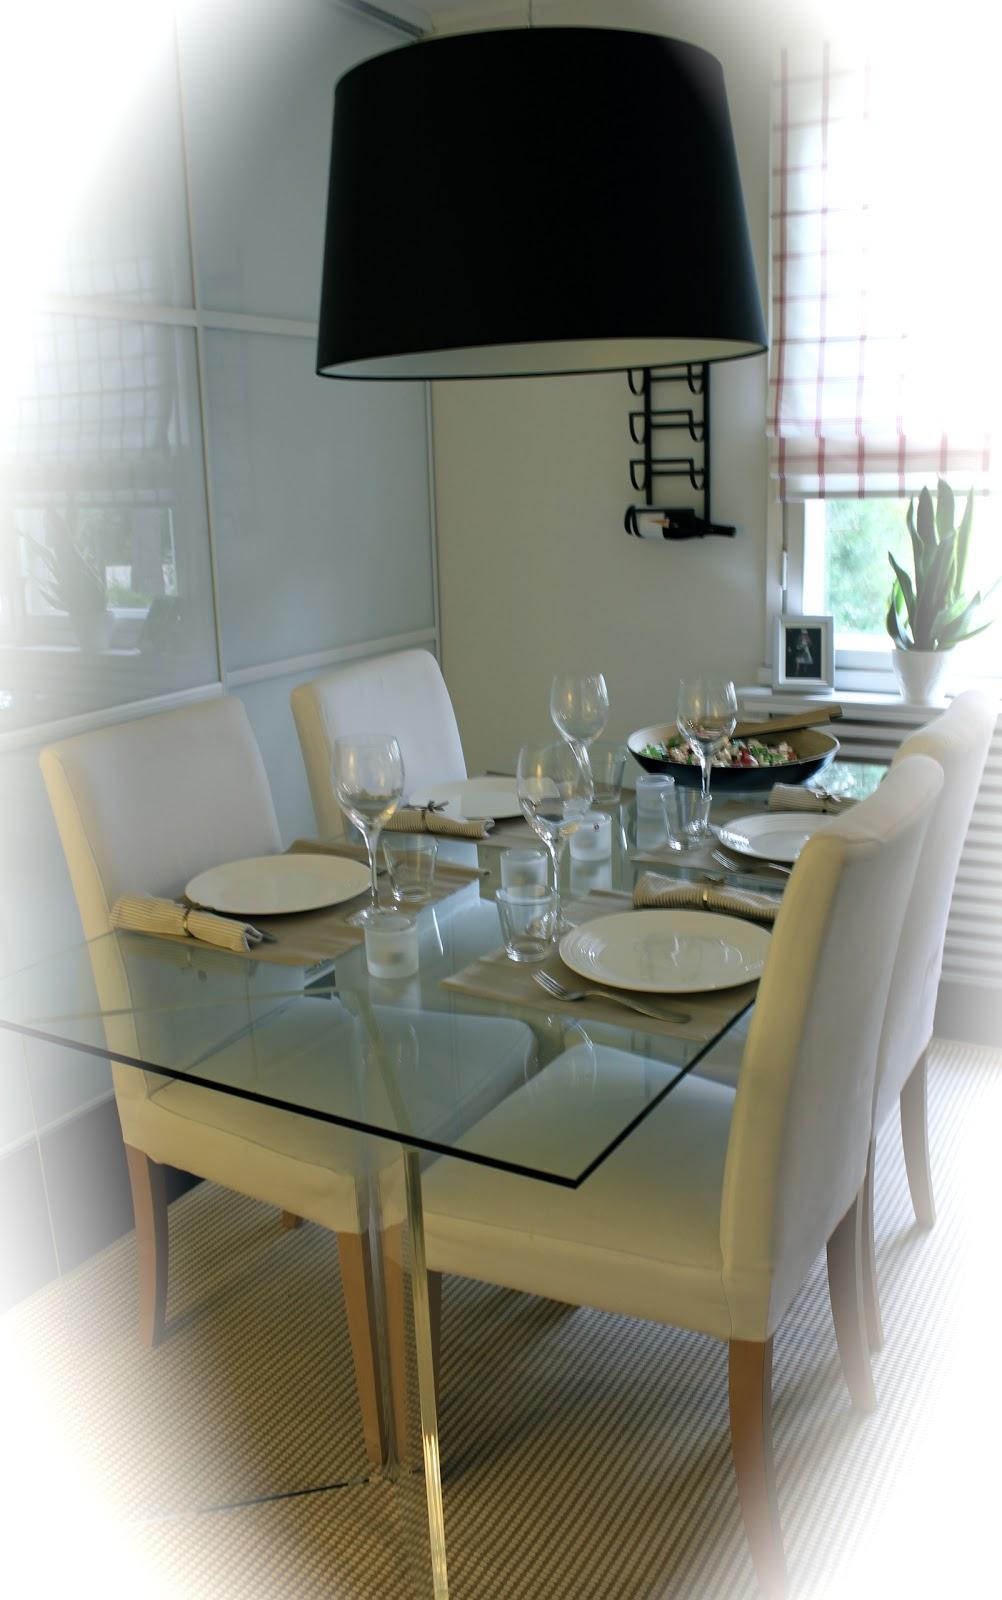 Design Koksbord :  design jasper conrad samt kosta bodas hand blosta chateau glas design